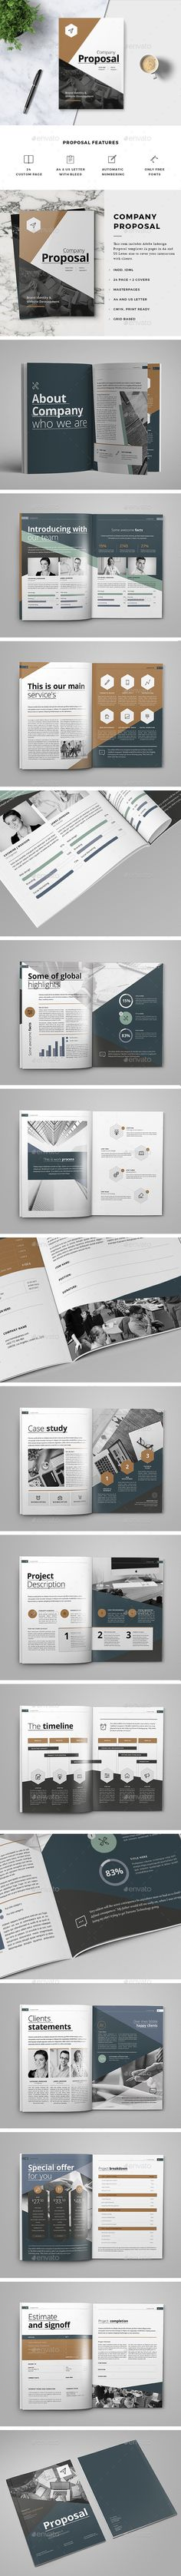 Project u0026 Business Proposal v3 Business